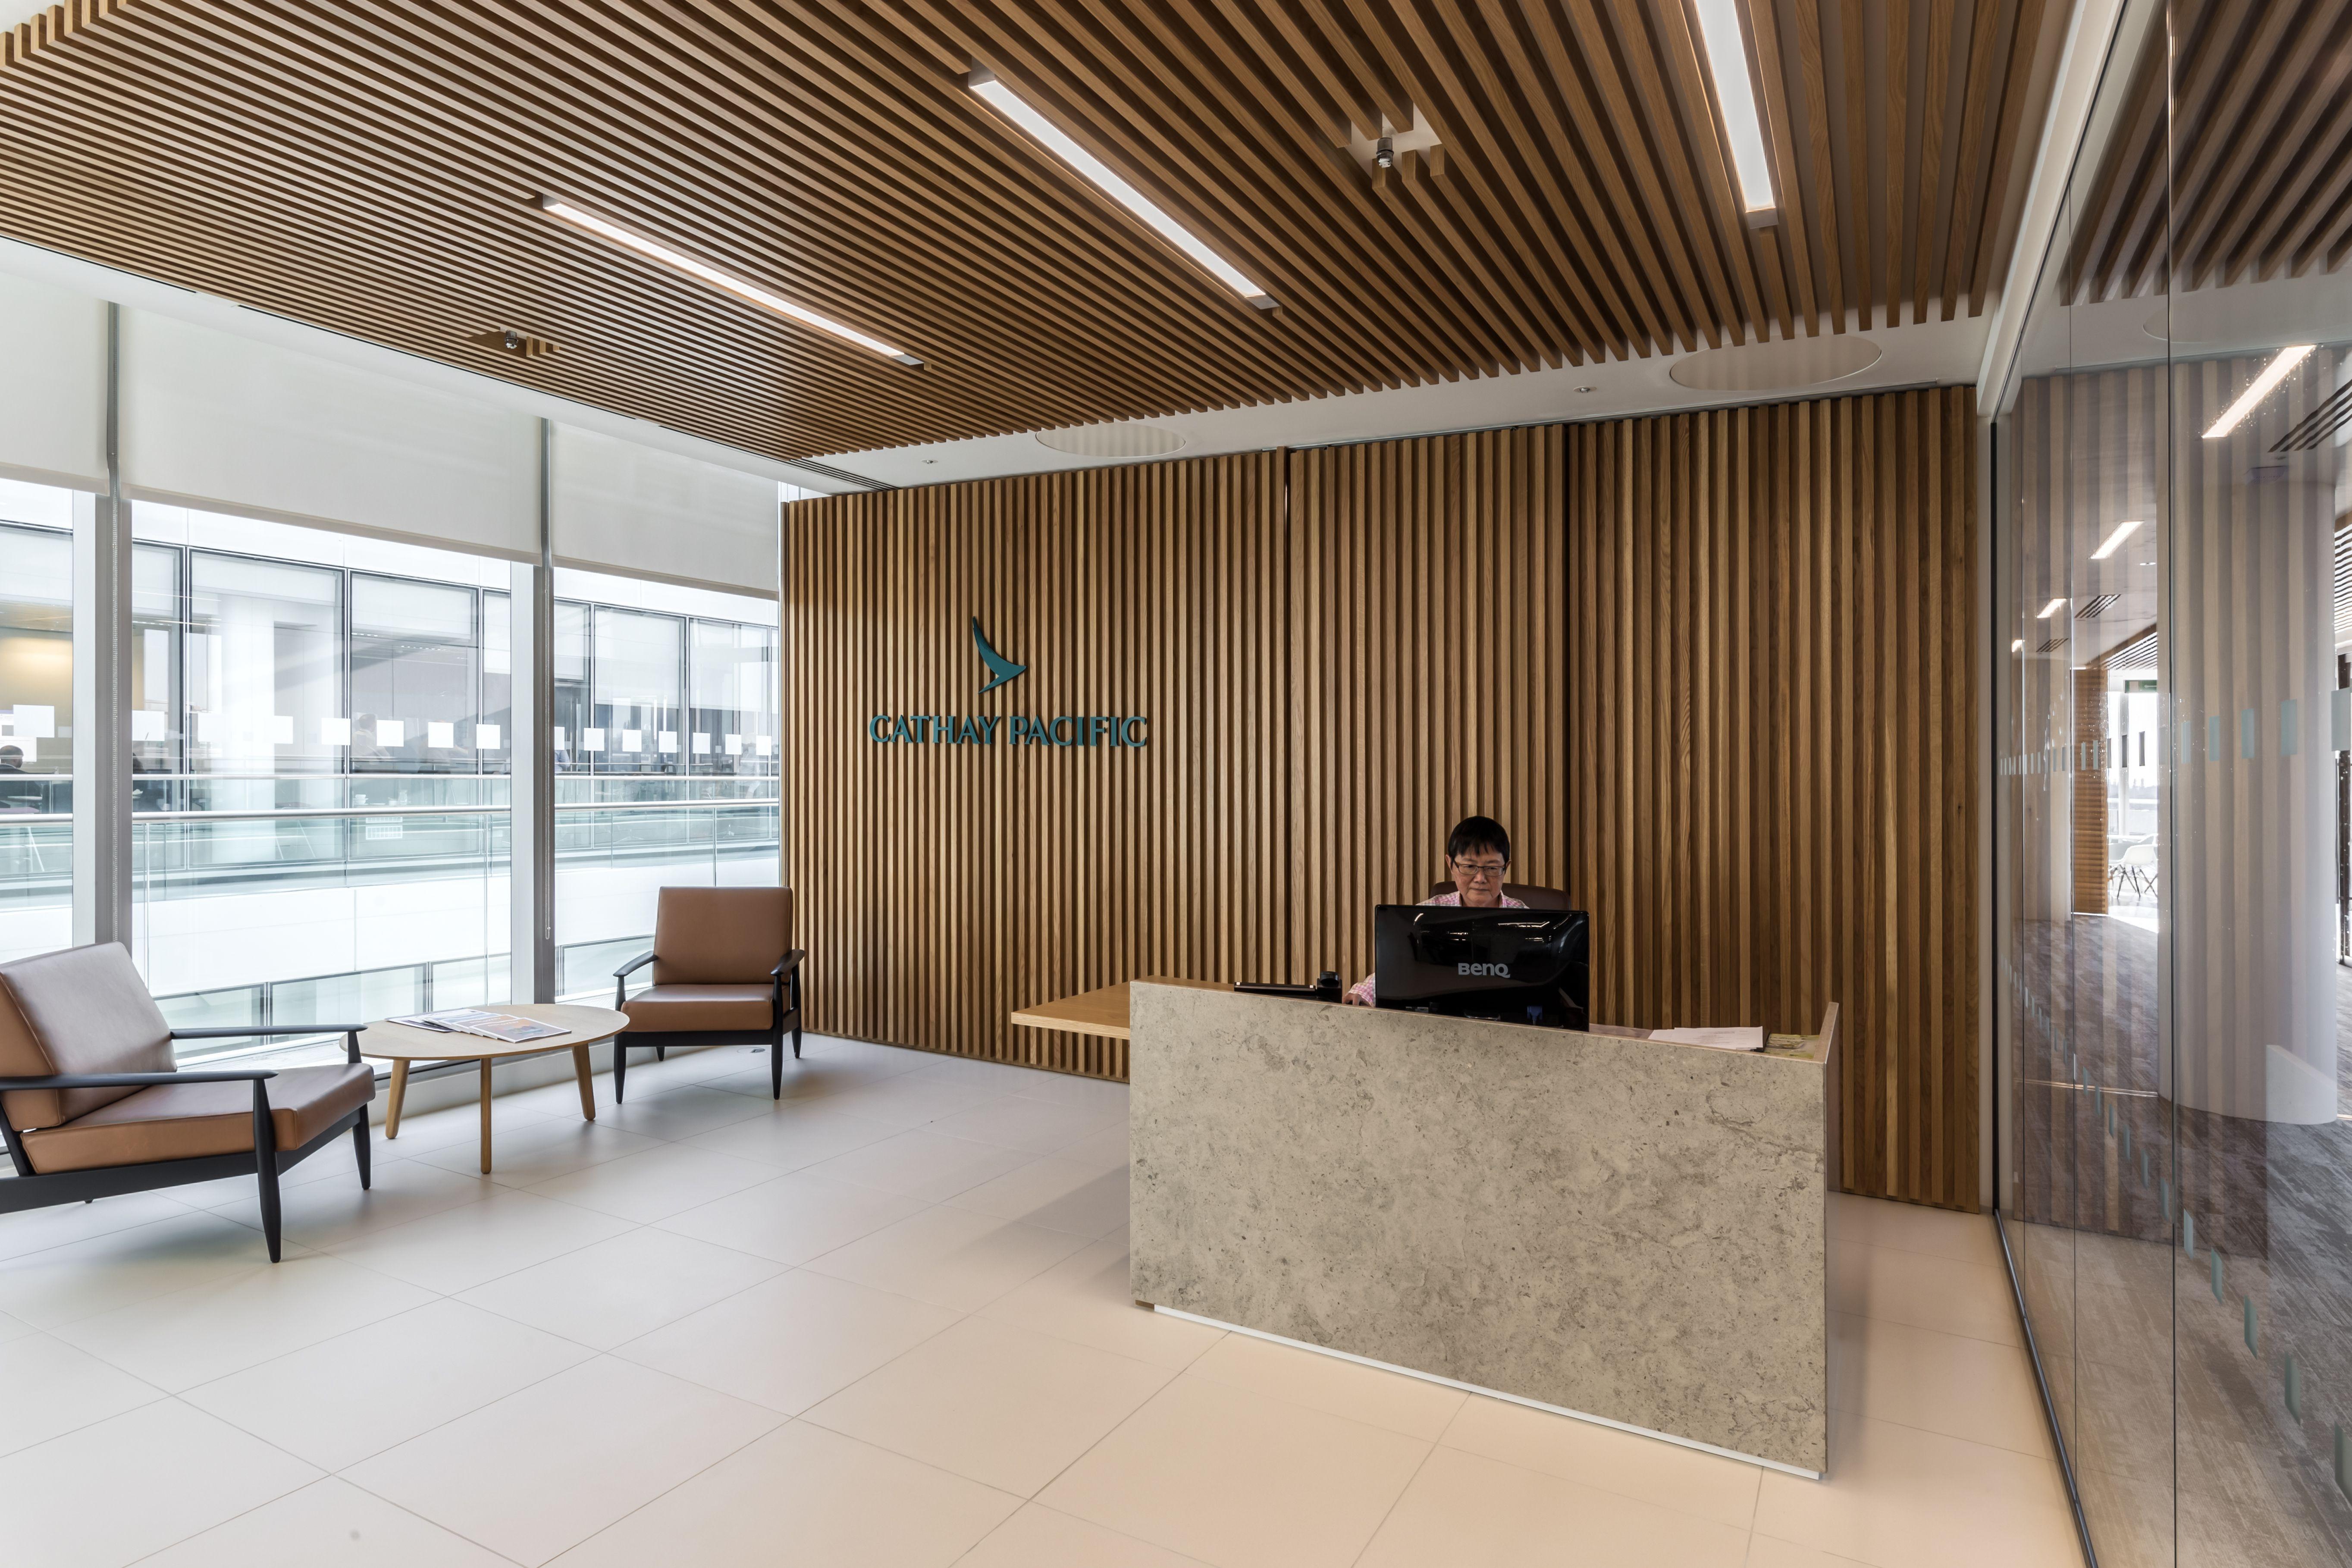 office foyer designs. Explore Reception Counter, Entry Foyer, And More! Office Foyer Designs F